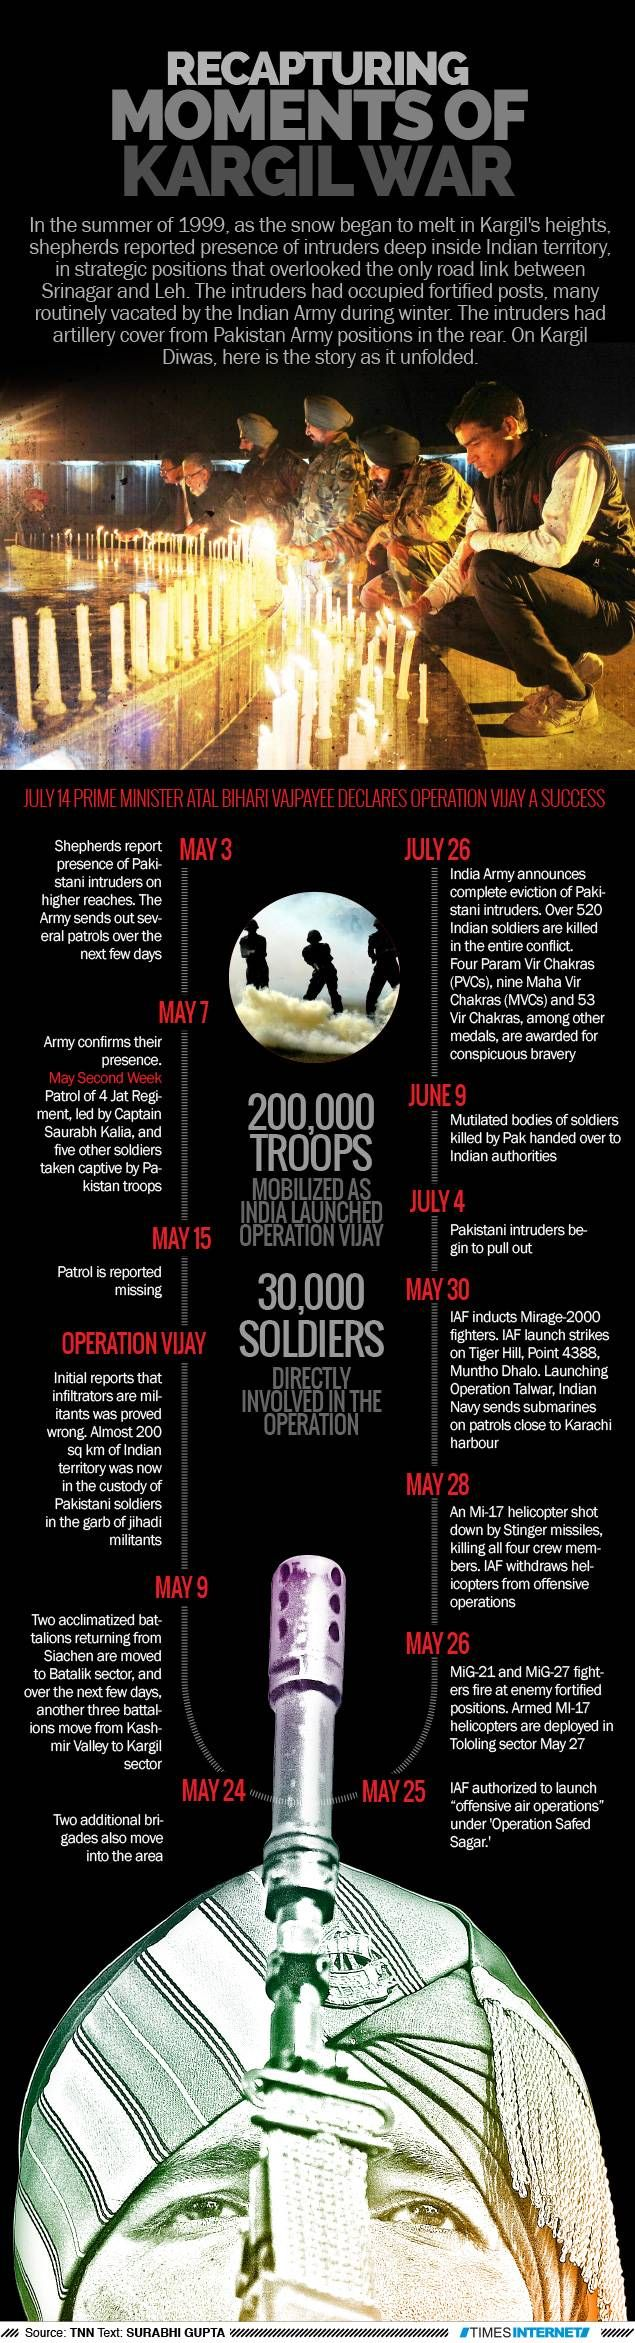 Recapturing moments of Kargil war  The Times of India